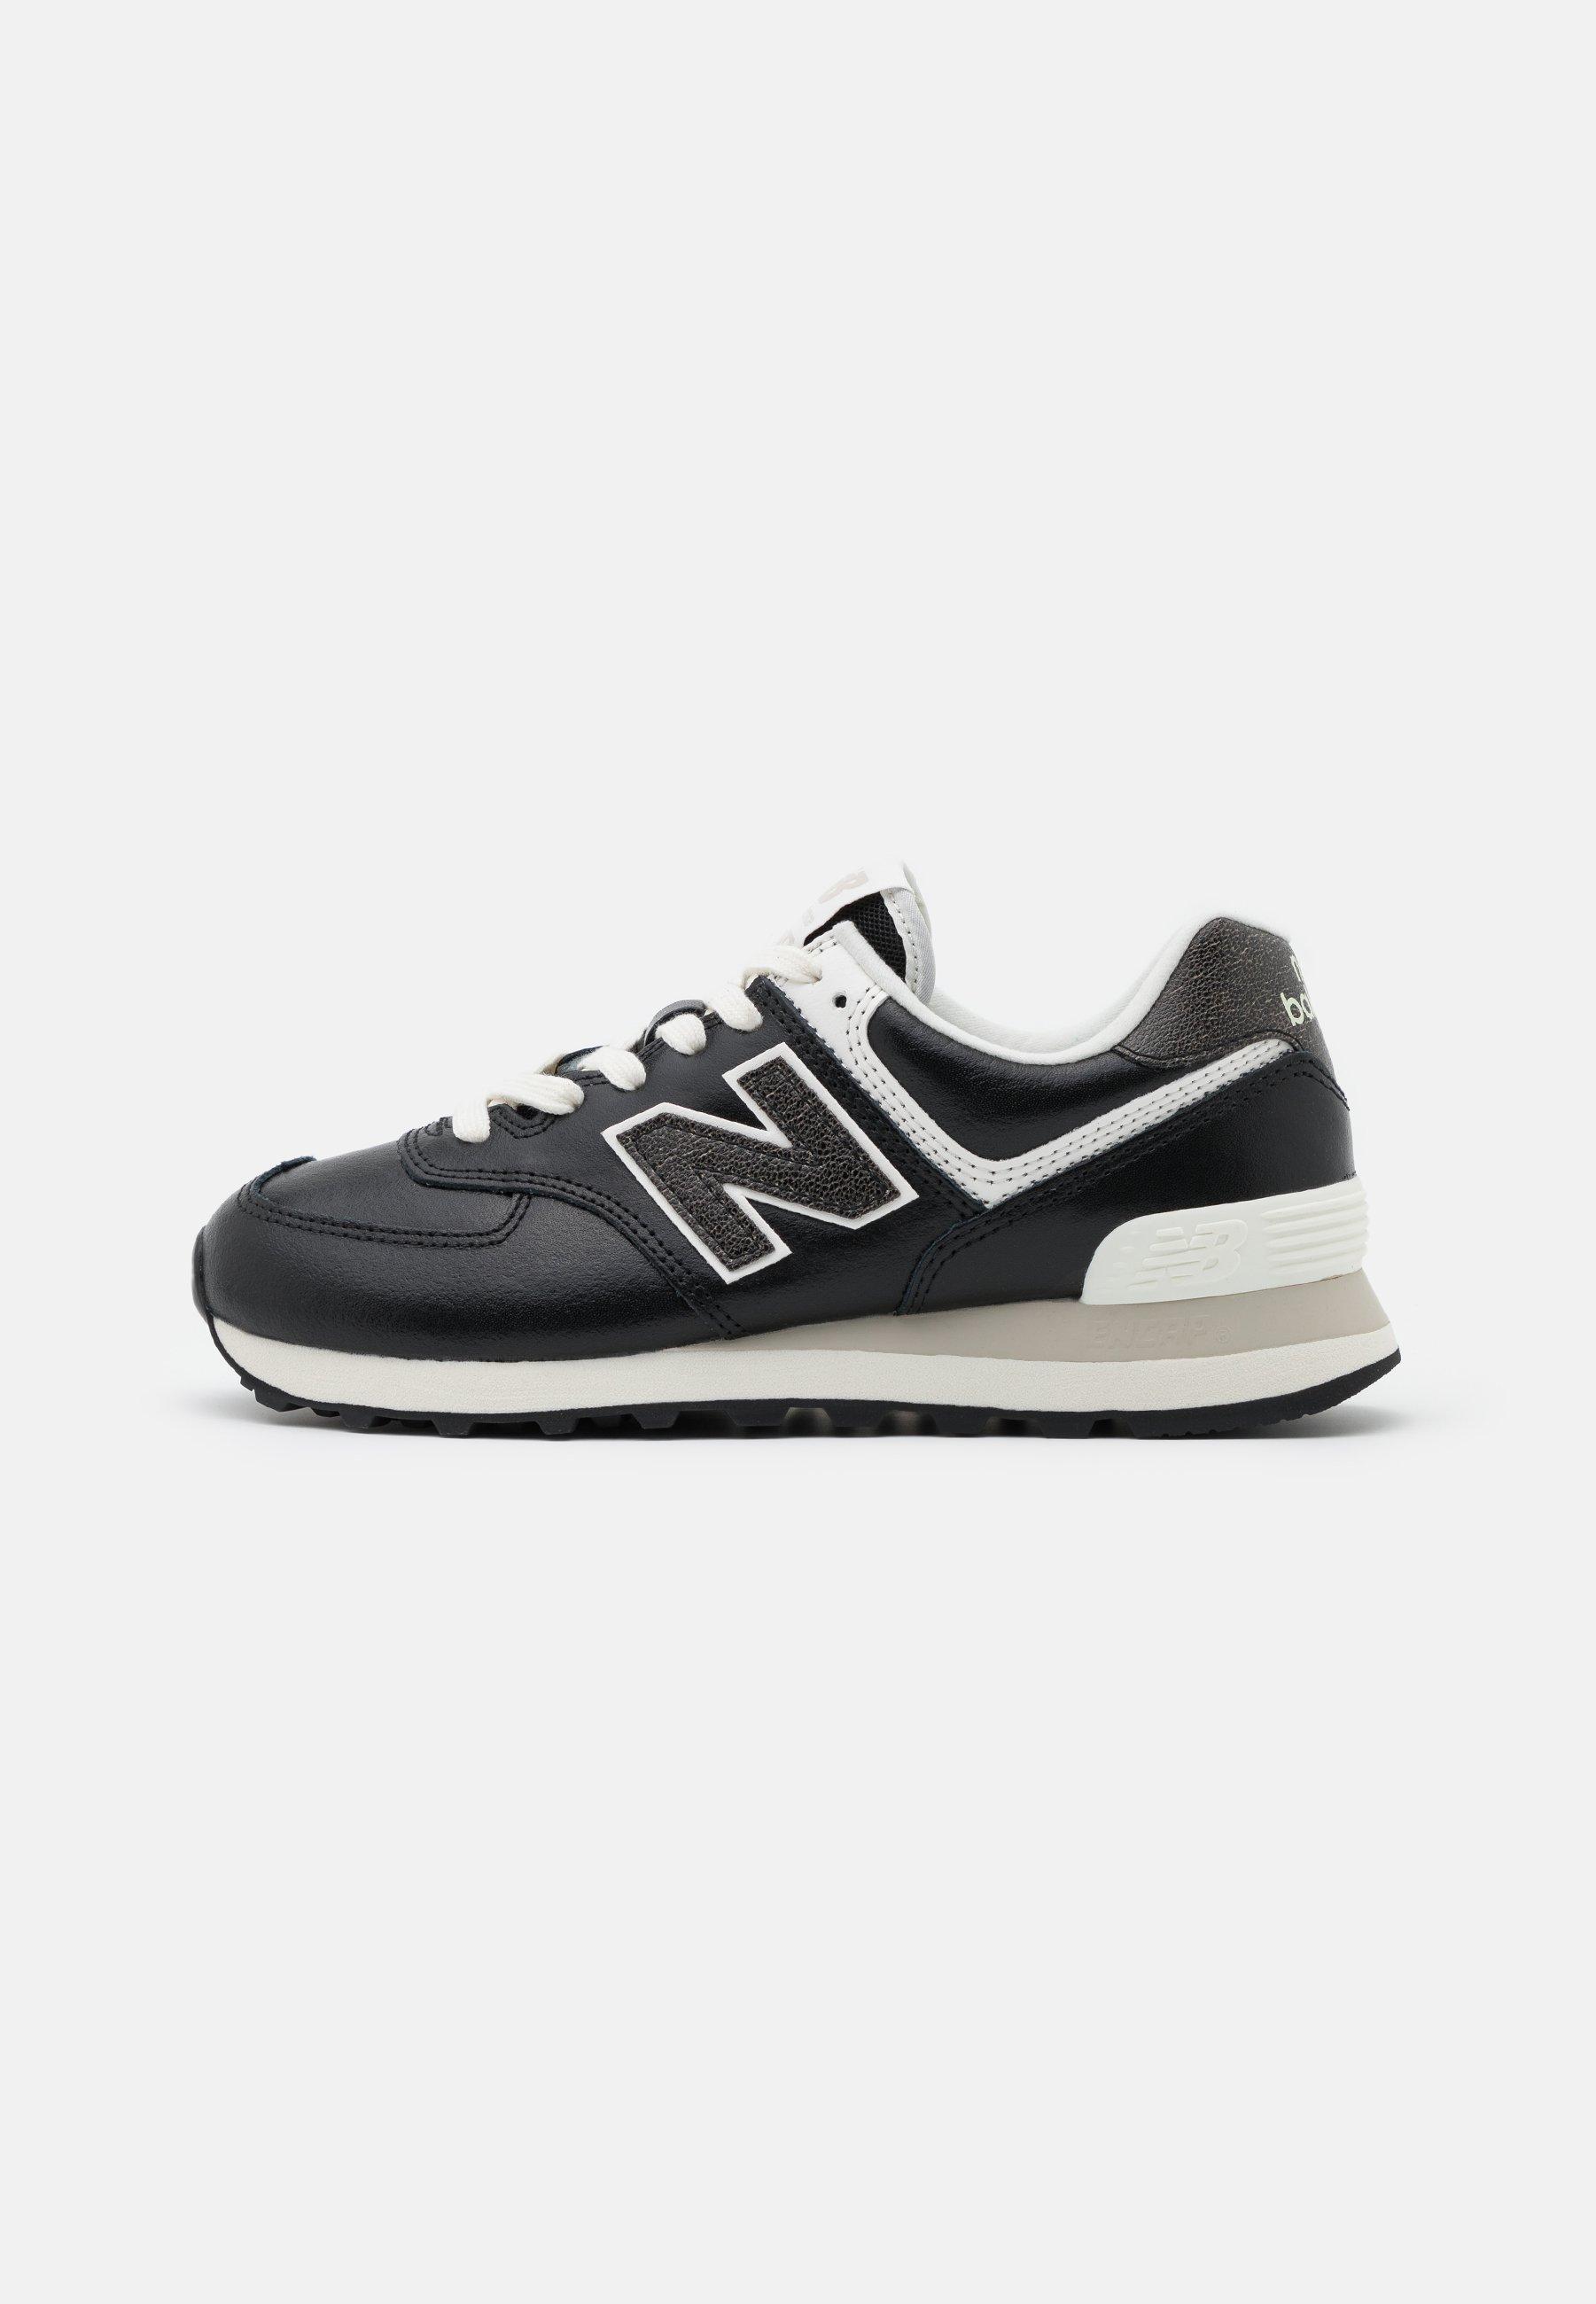 New Balance WL574 - Sneakers basse - black/white/nero - Zalando.it